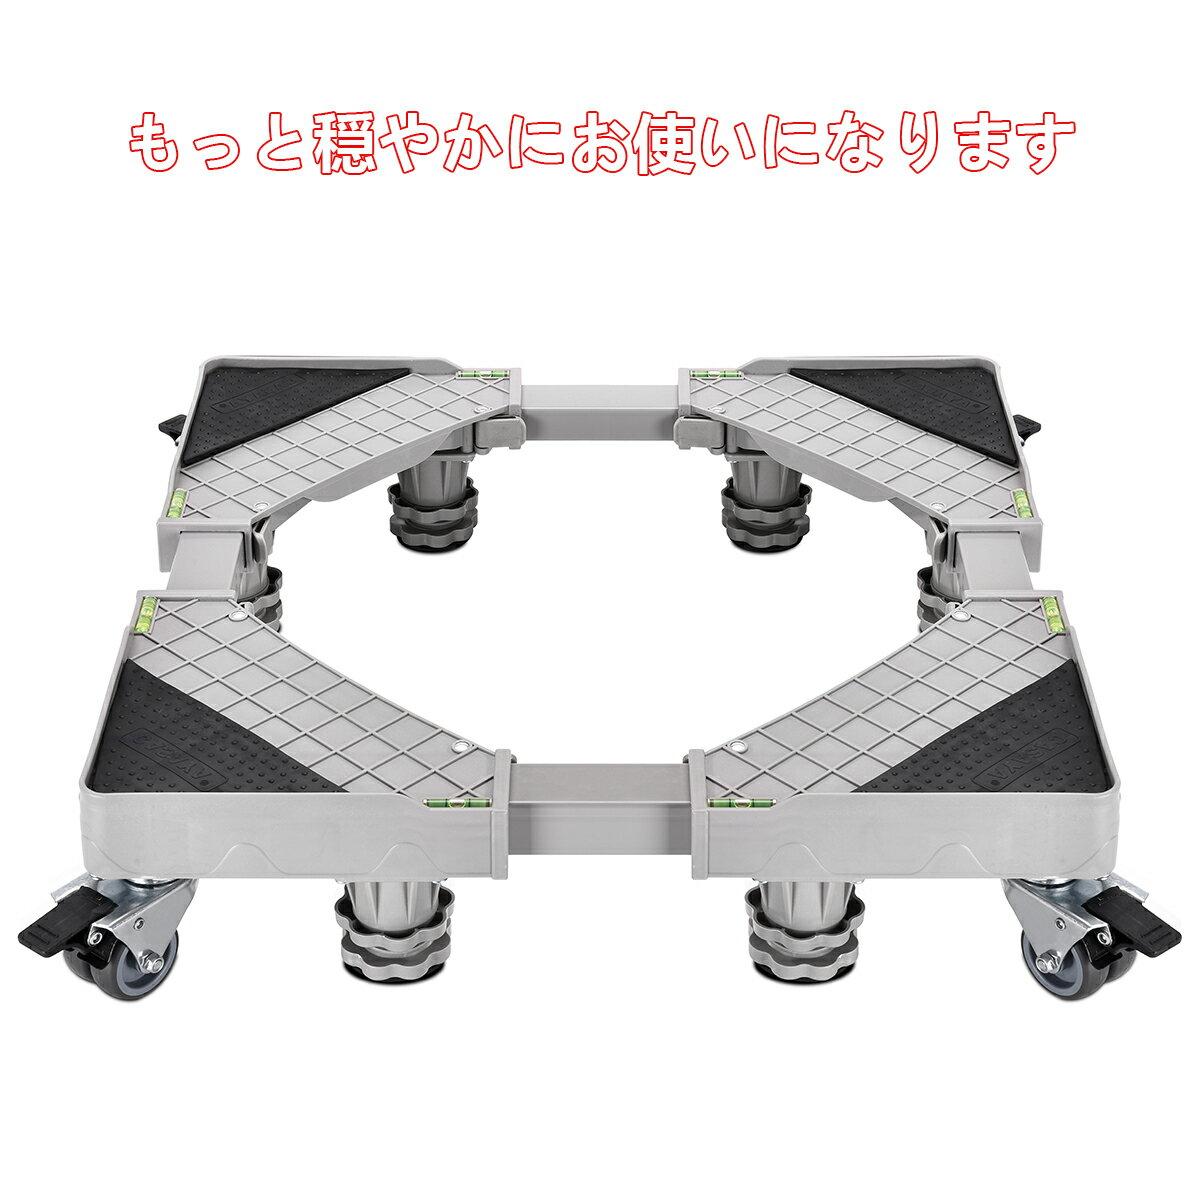 nisso-online 洗濯機置き台 専用オプション フィート/ドラムx4 高さ10~13cm【部品のみ】大型家電かさ上げ台に組立 耐荷重500kg